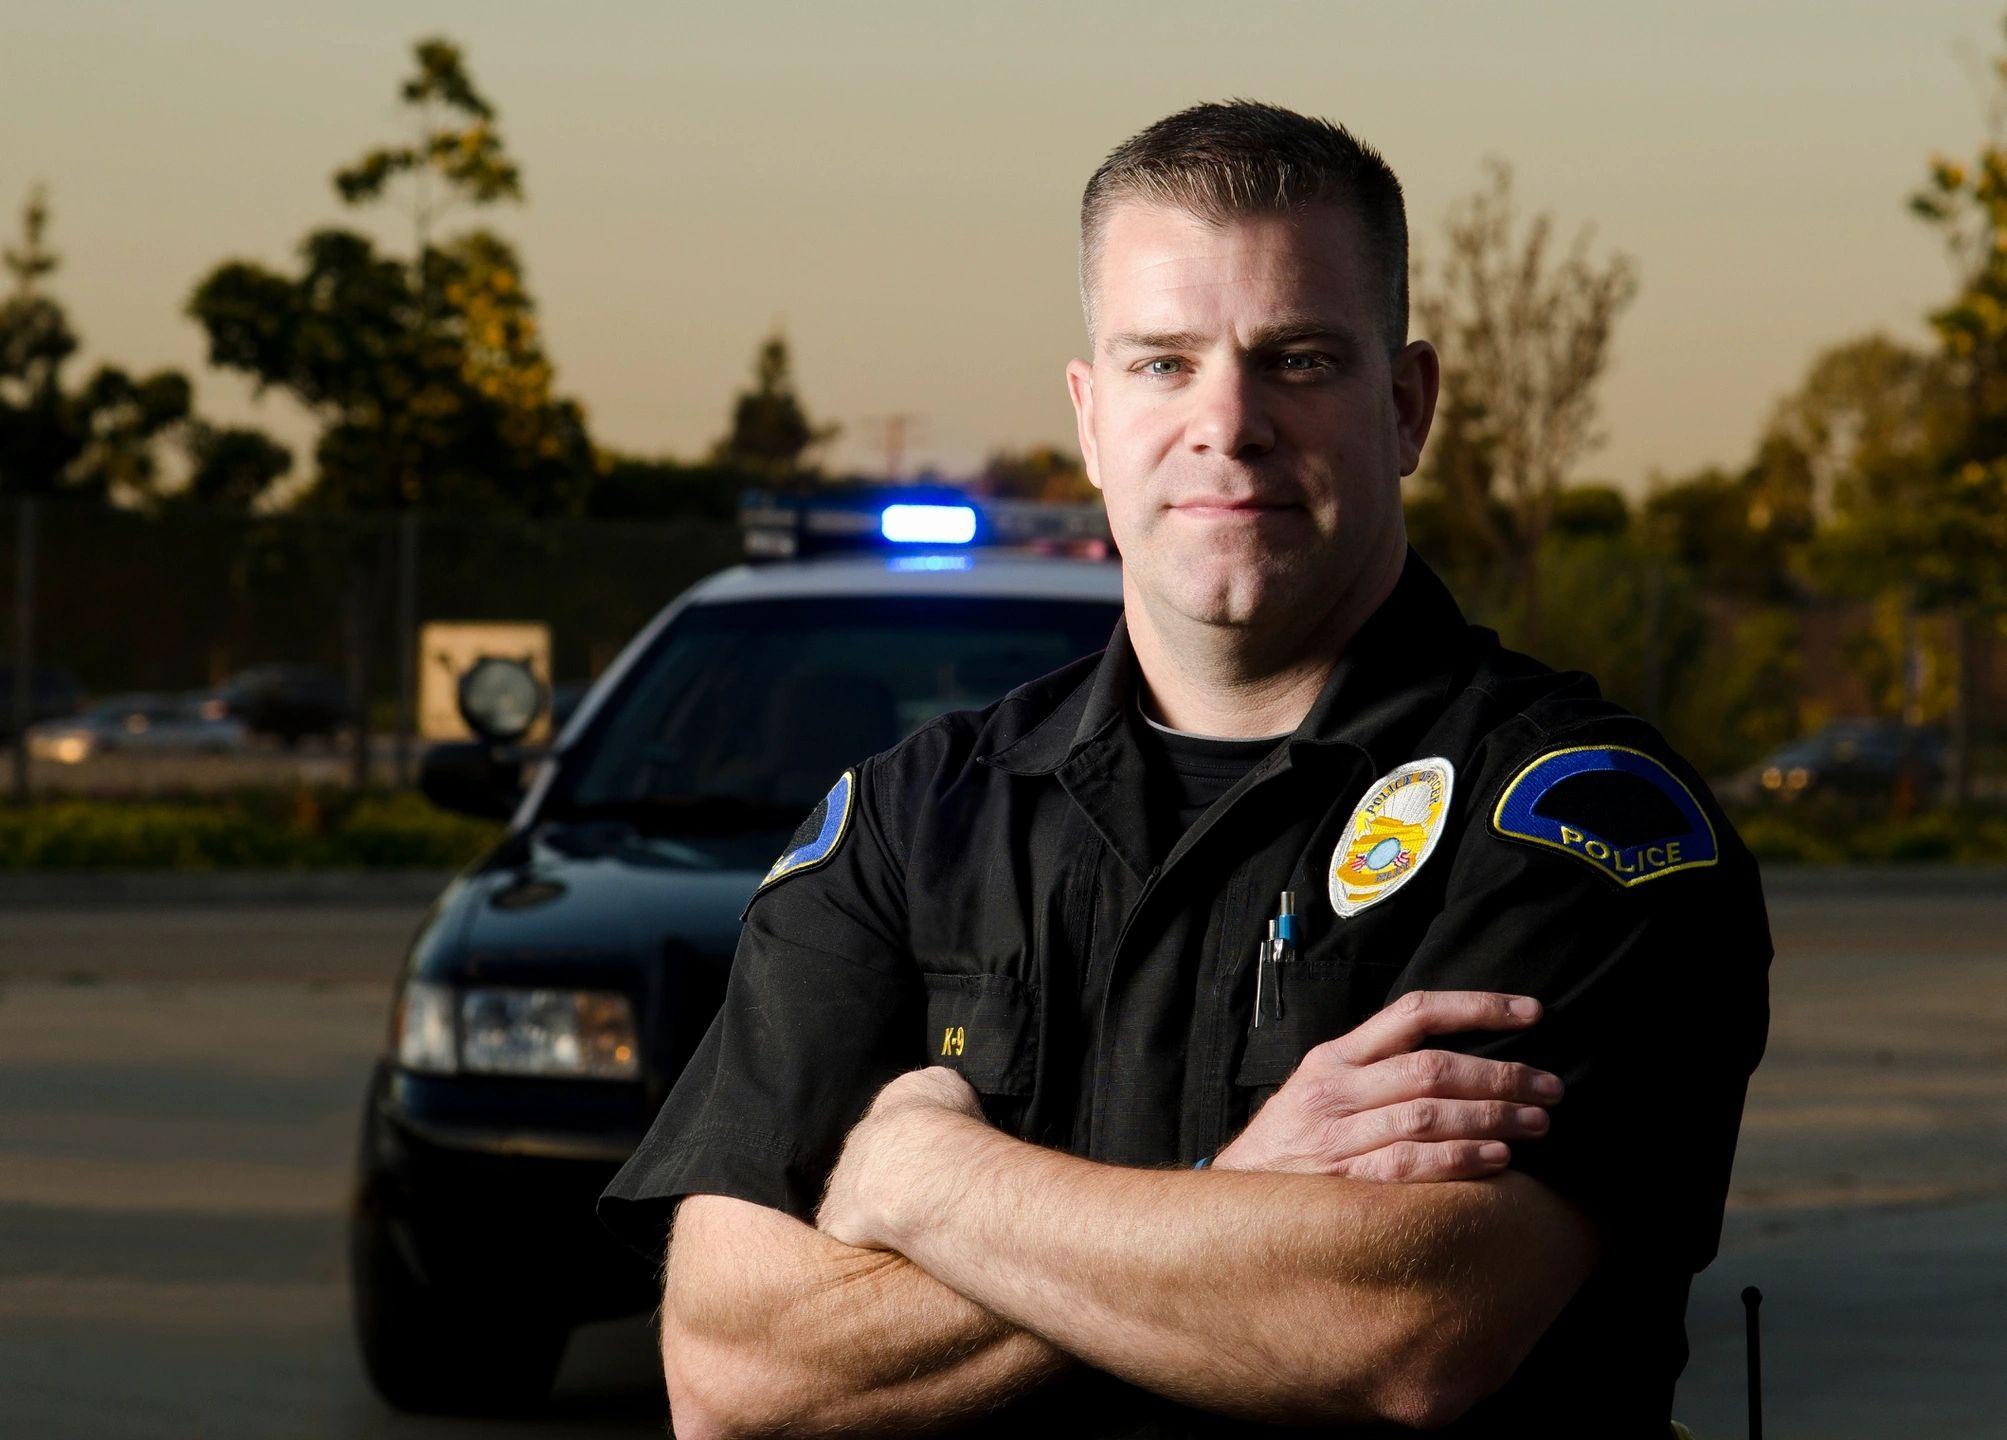 Defunding Police